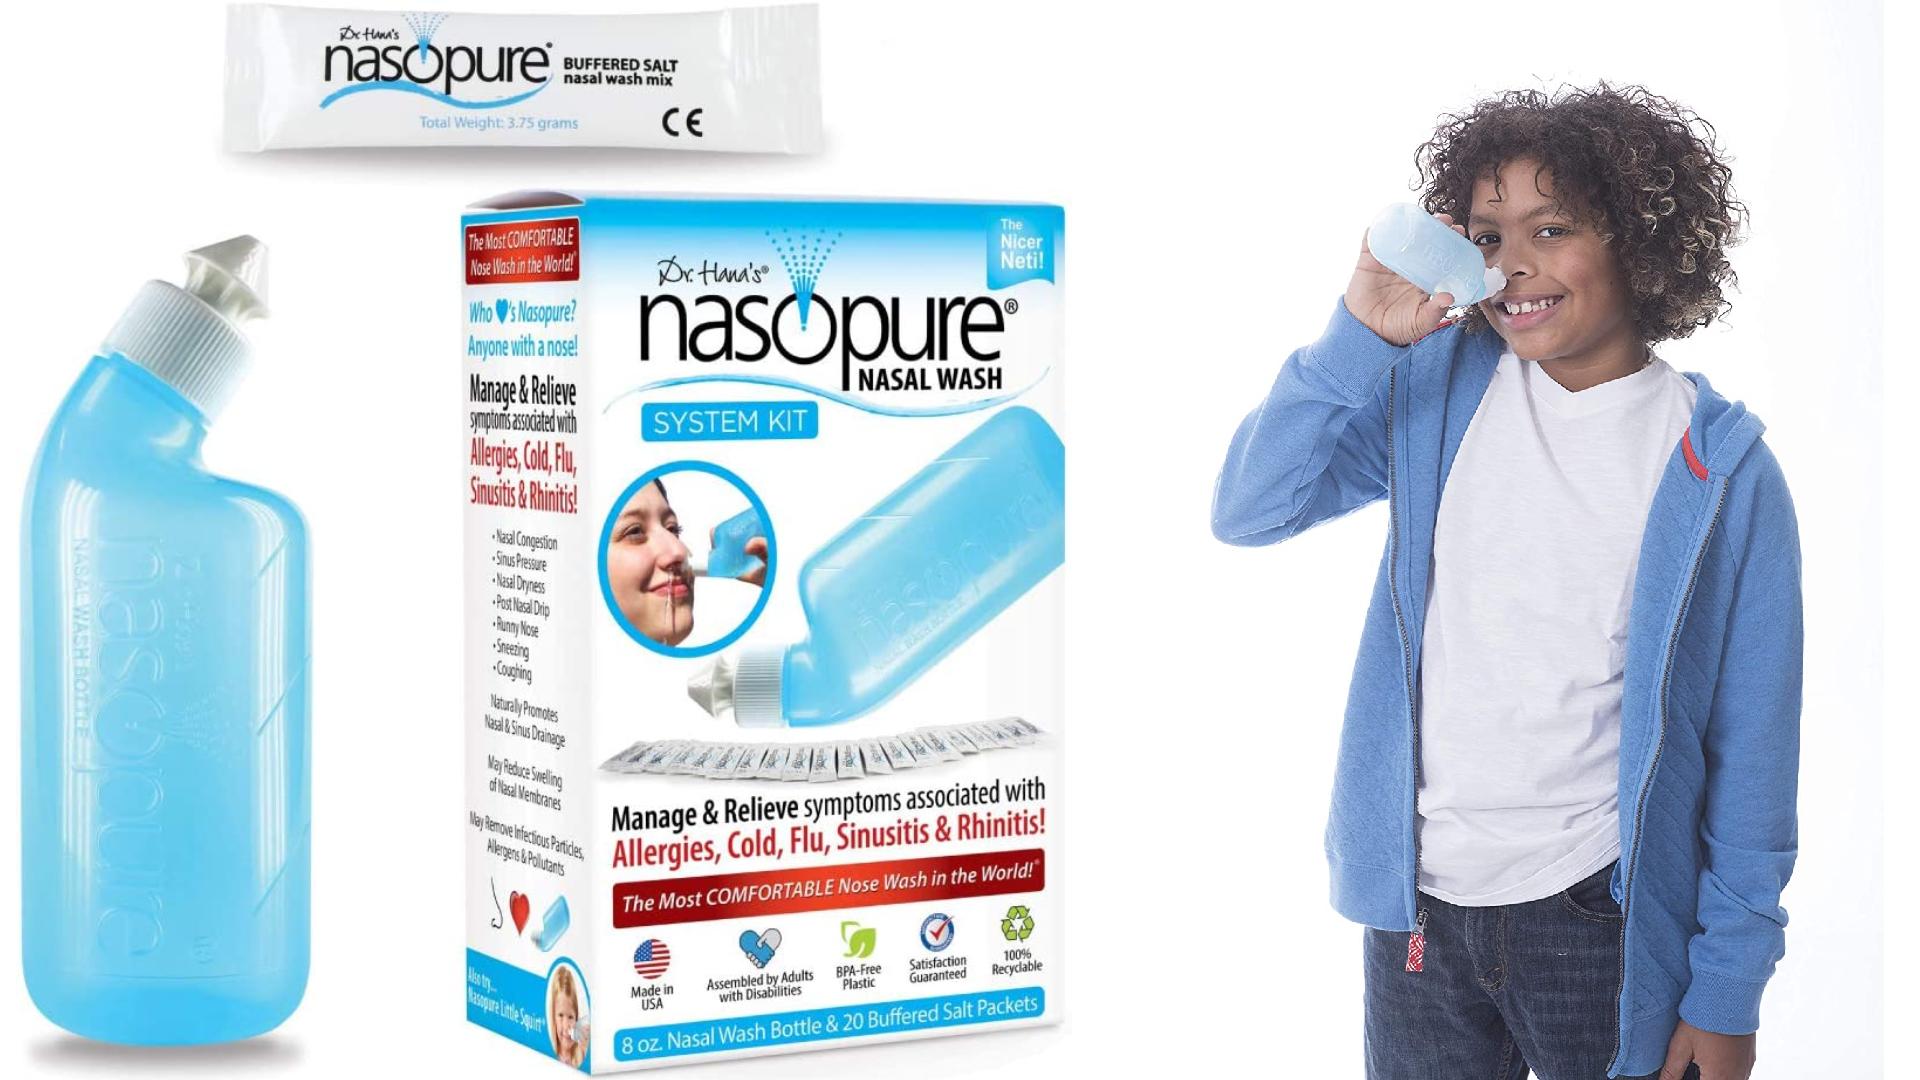 nasopure neti pot nasal irrigation system with a boy demonstrating use